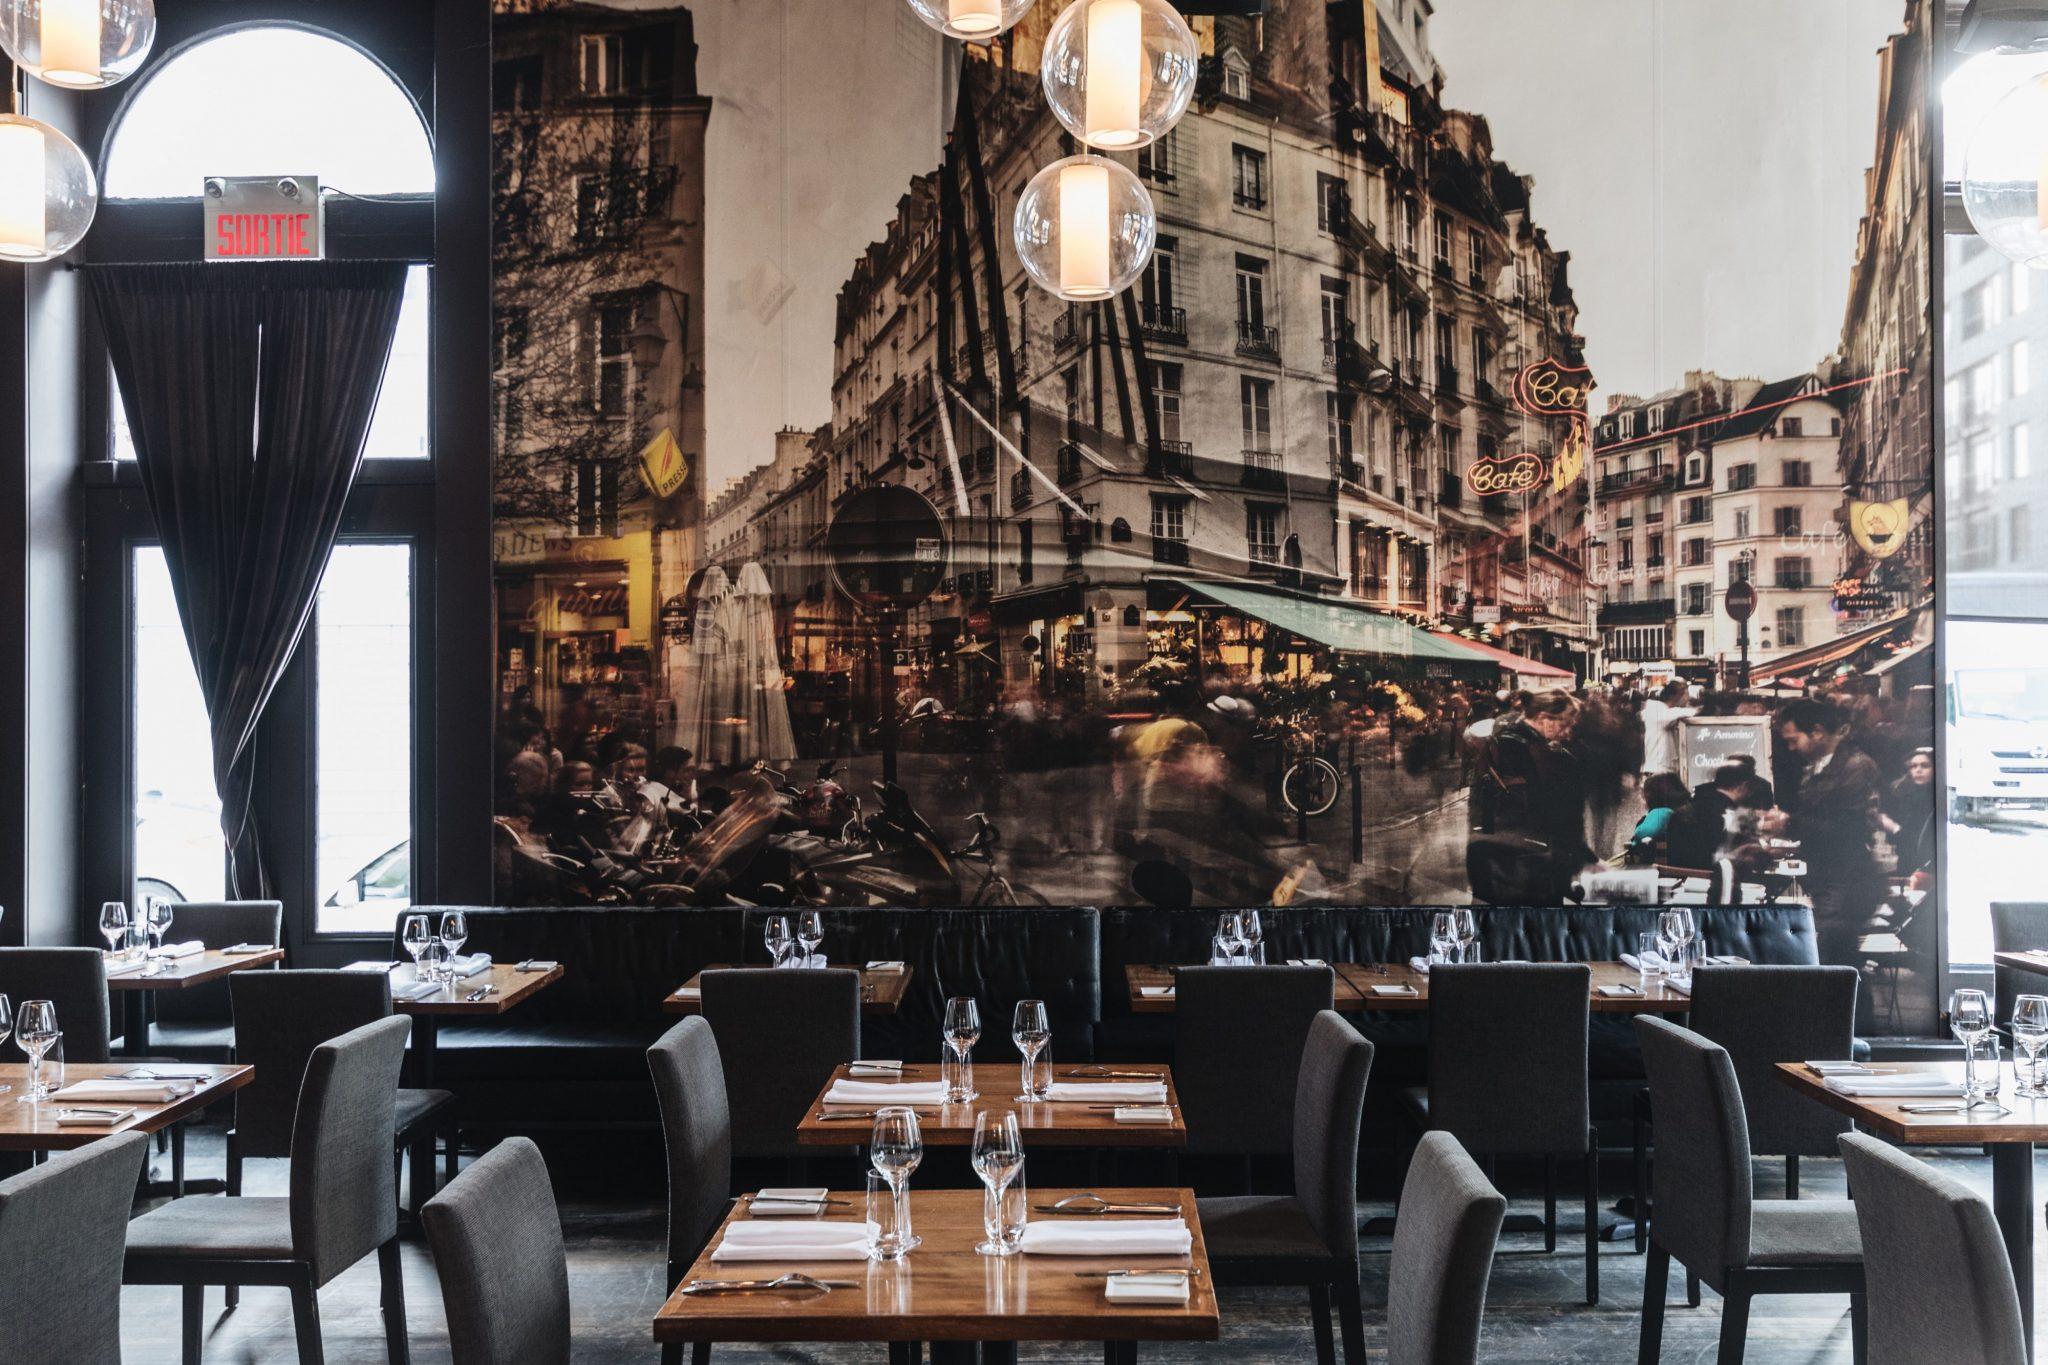 Photo courtoisie : restaurant Les 400 coups